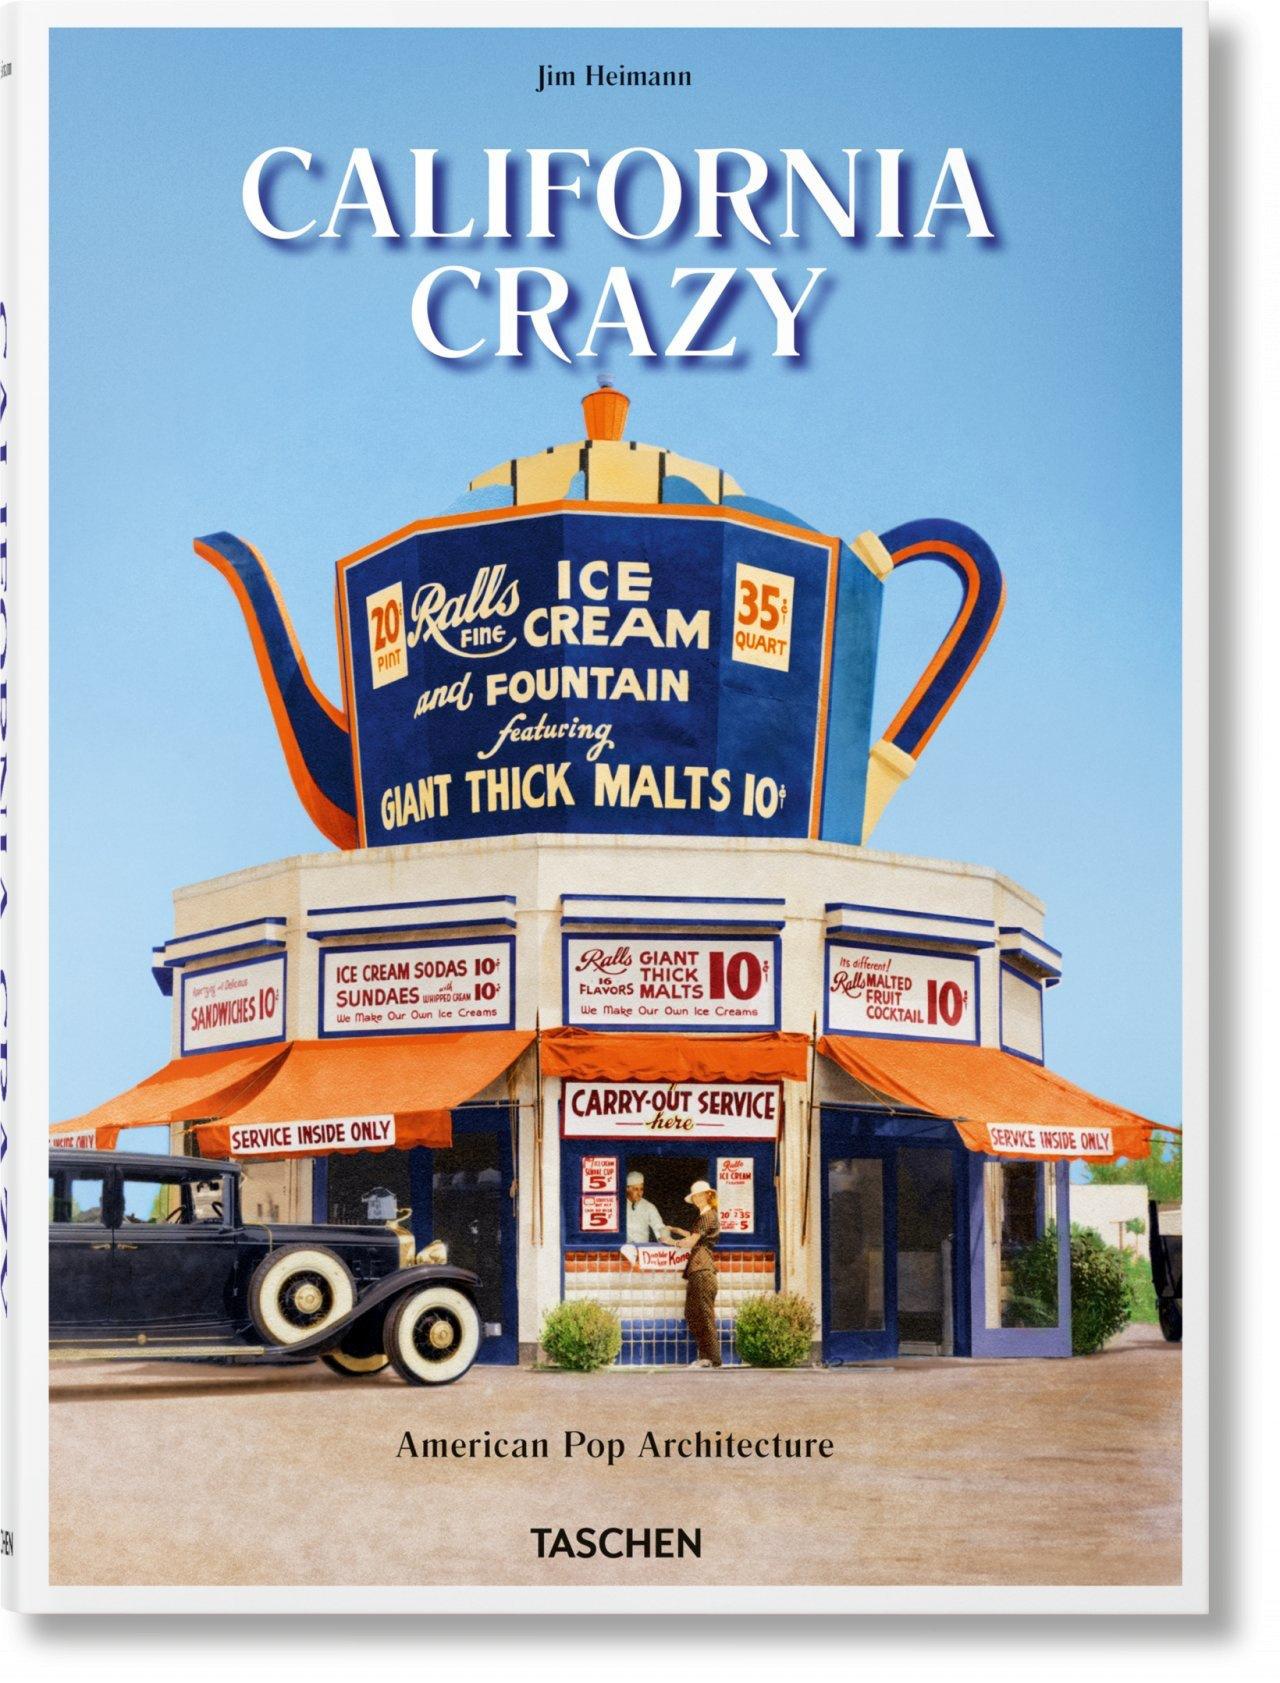 CALIFORNIA CRAZY. AMERICAN POP ARCHITECTURE - AMERCIAN POP ARCHITECTURE